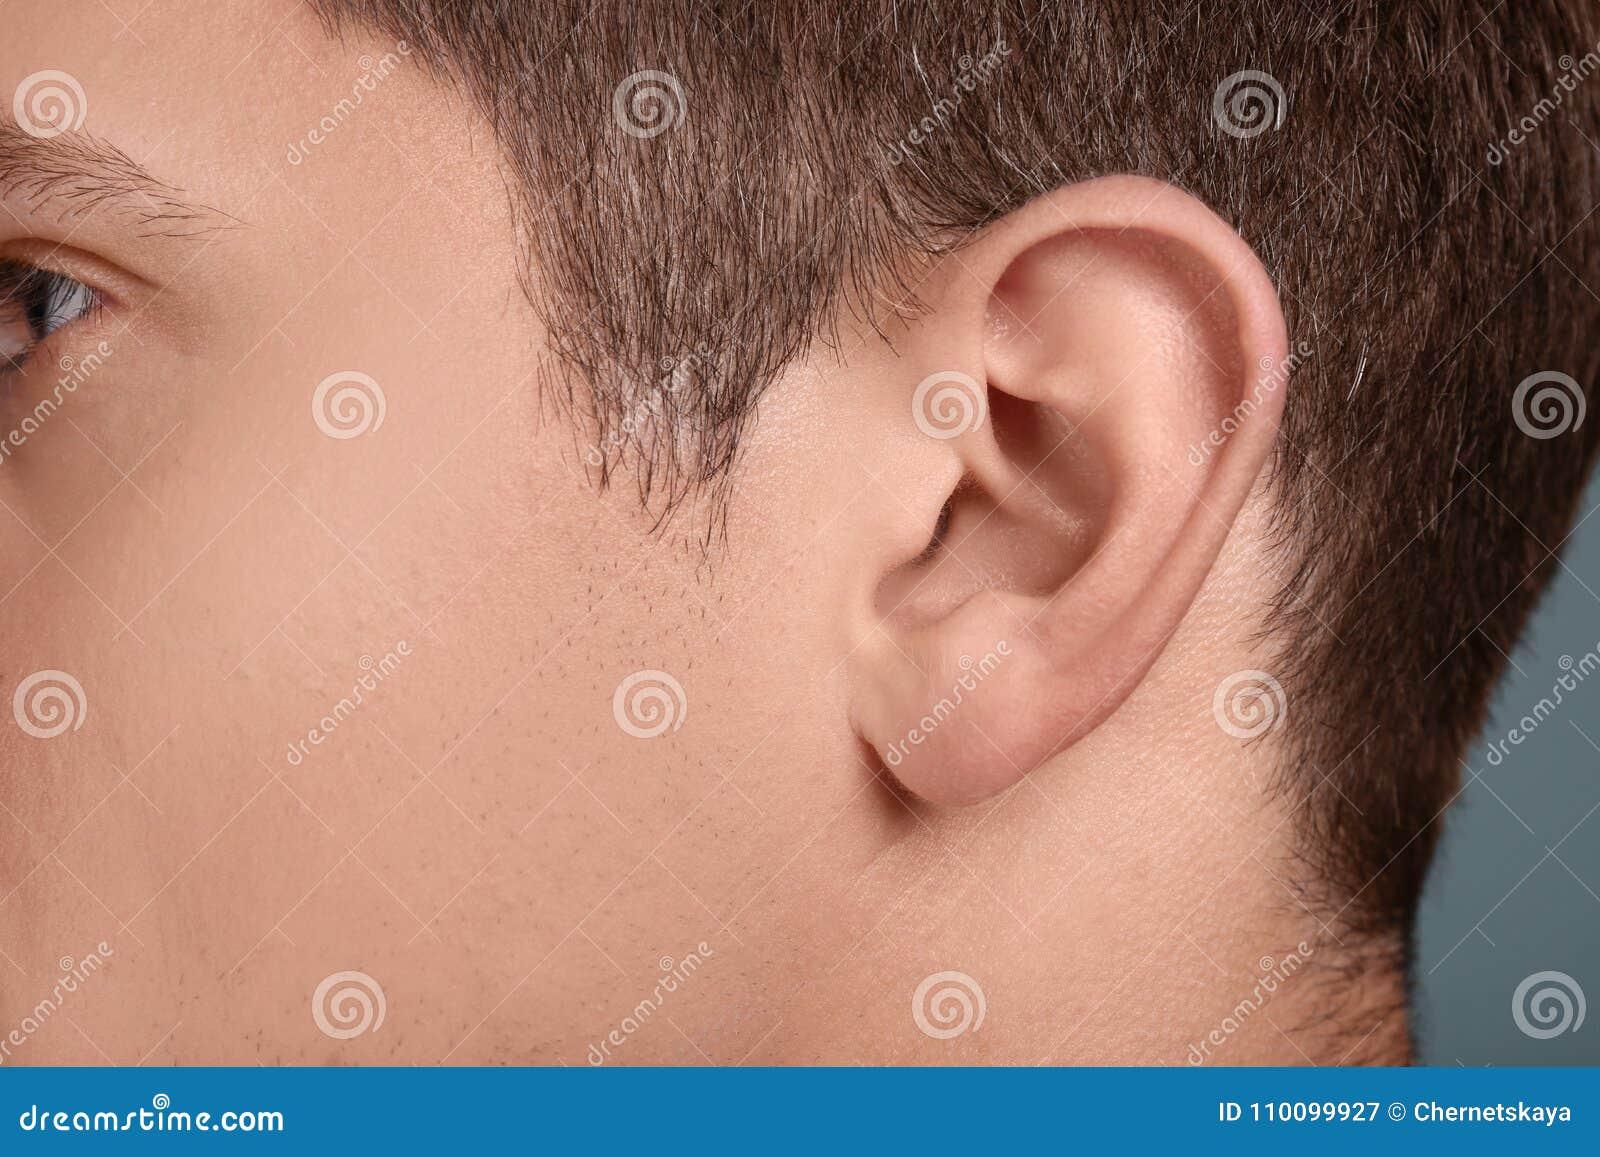 Young man, closeup of ear.